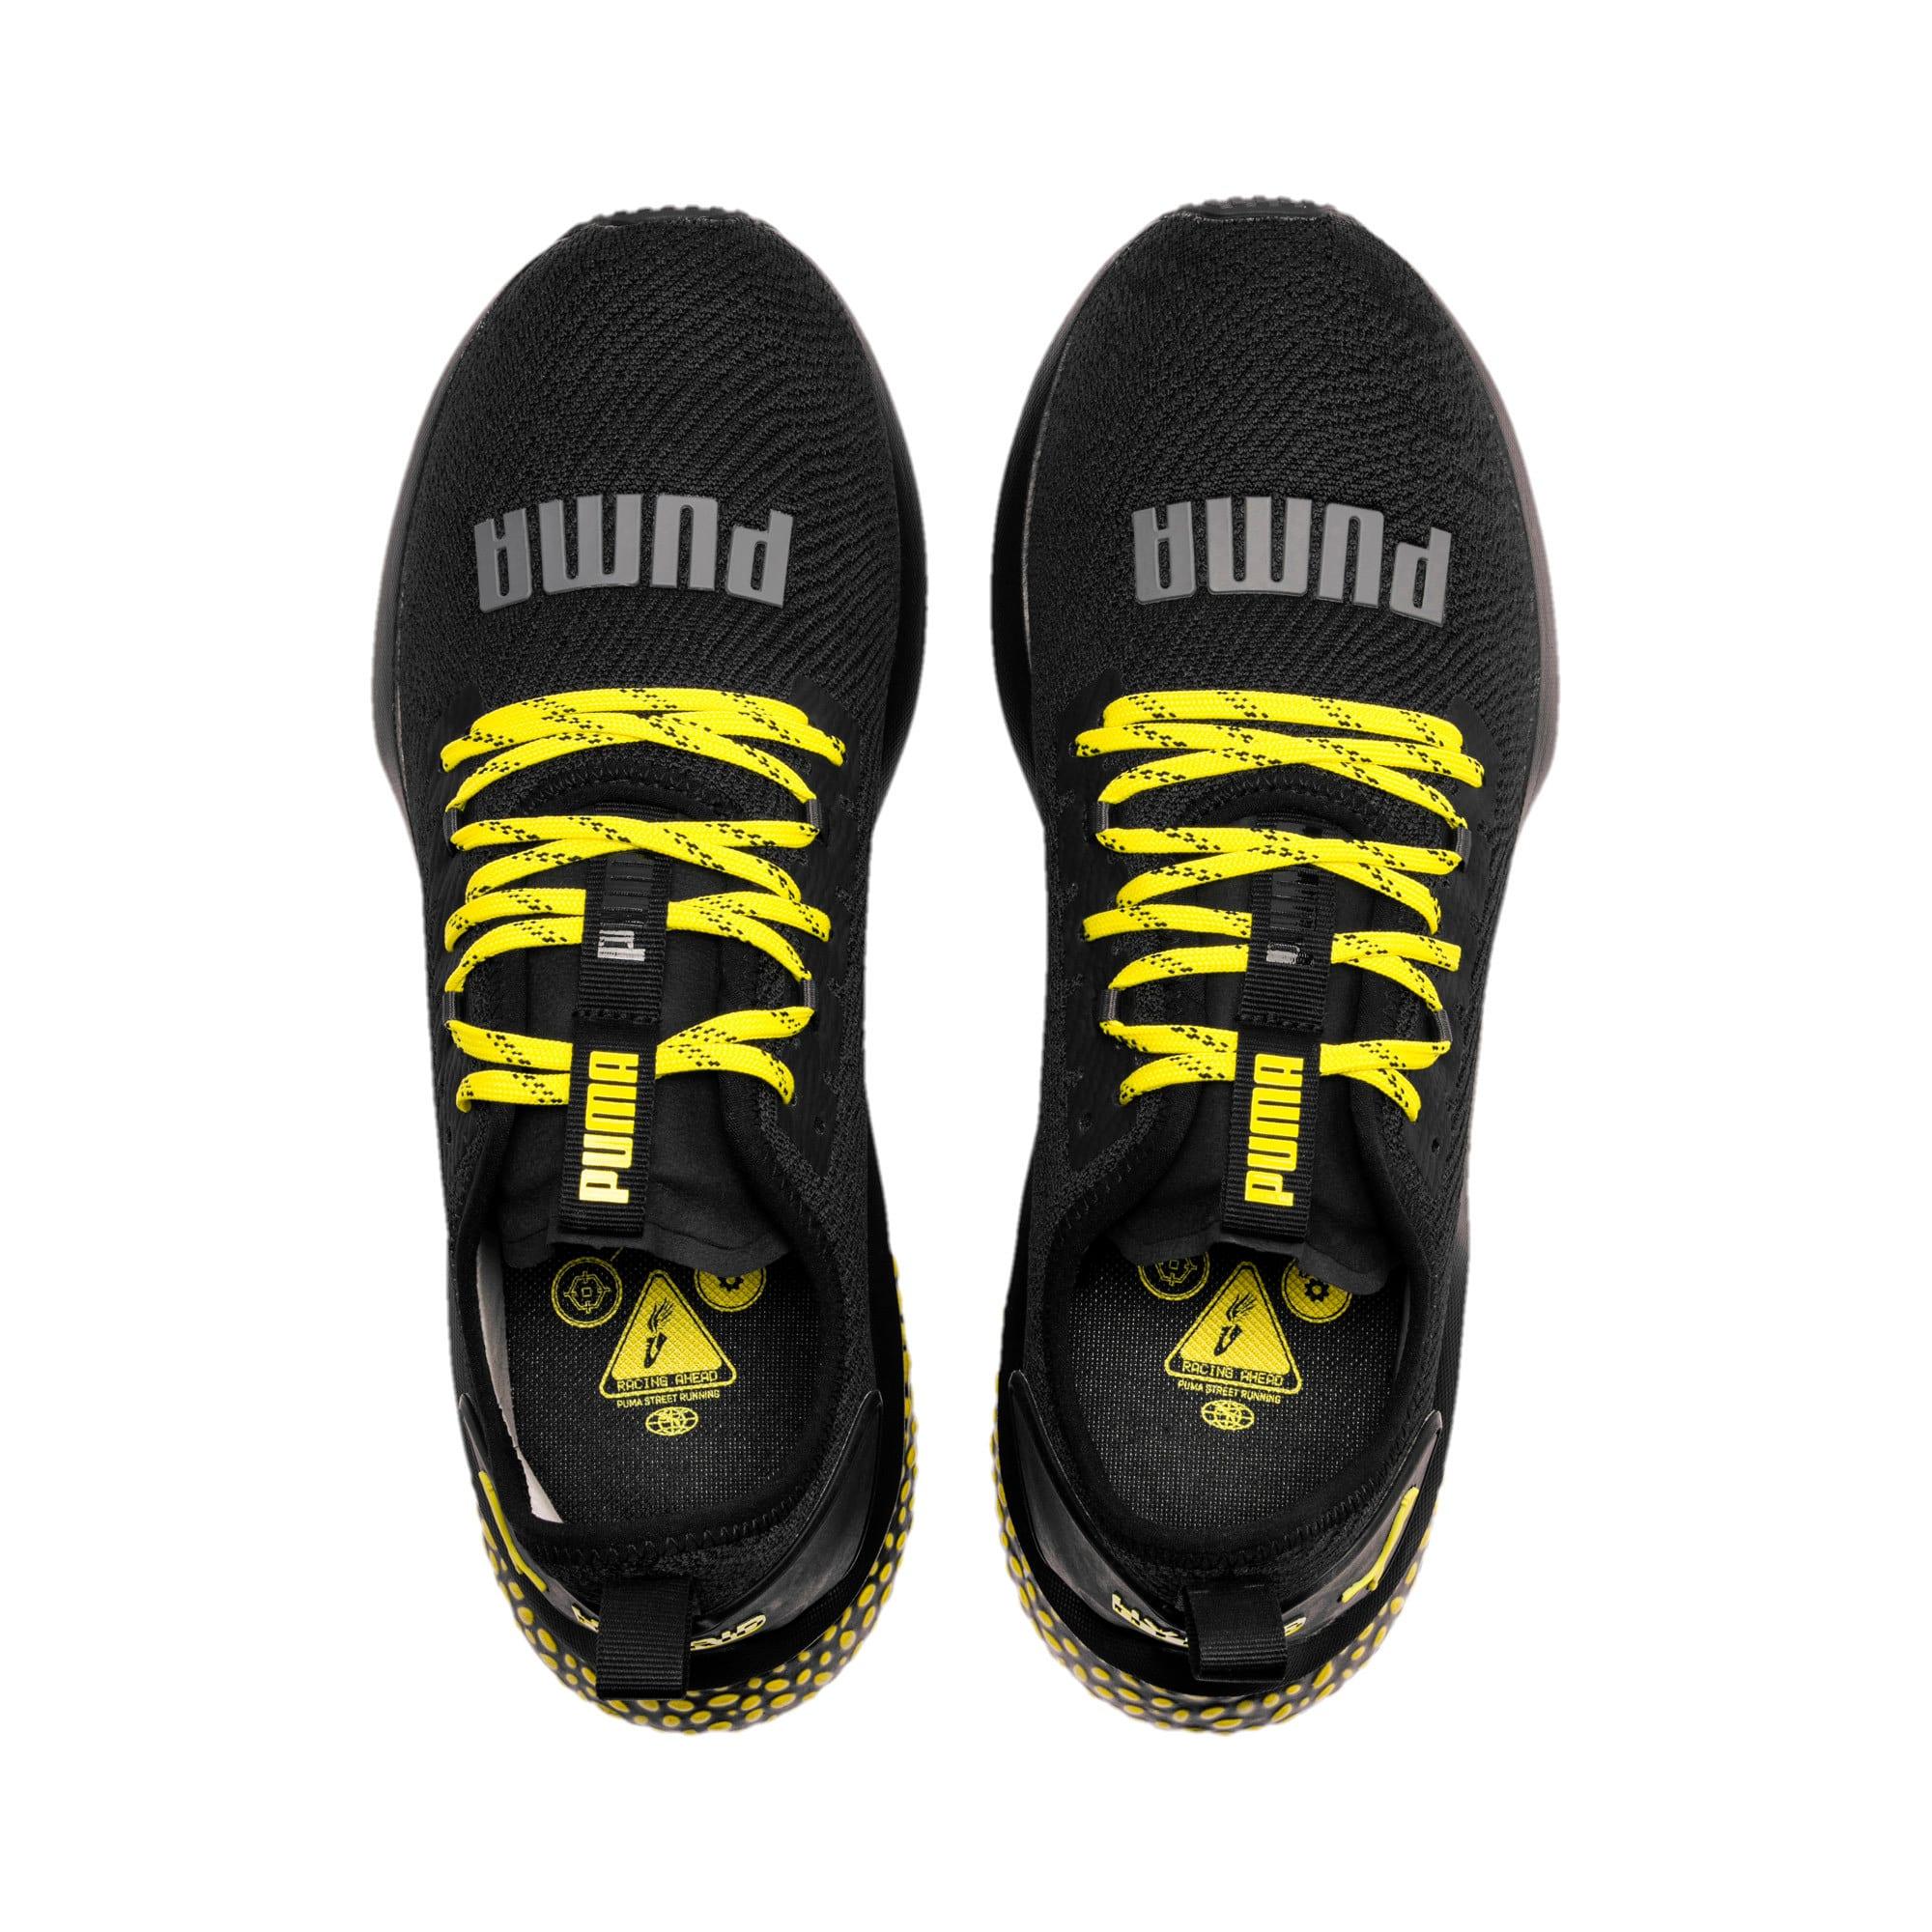 Thumbnail 6 of HYBRID NX Caution hardloopschoenen voor heren, Puma Black-Blazing Yellow, medium